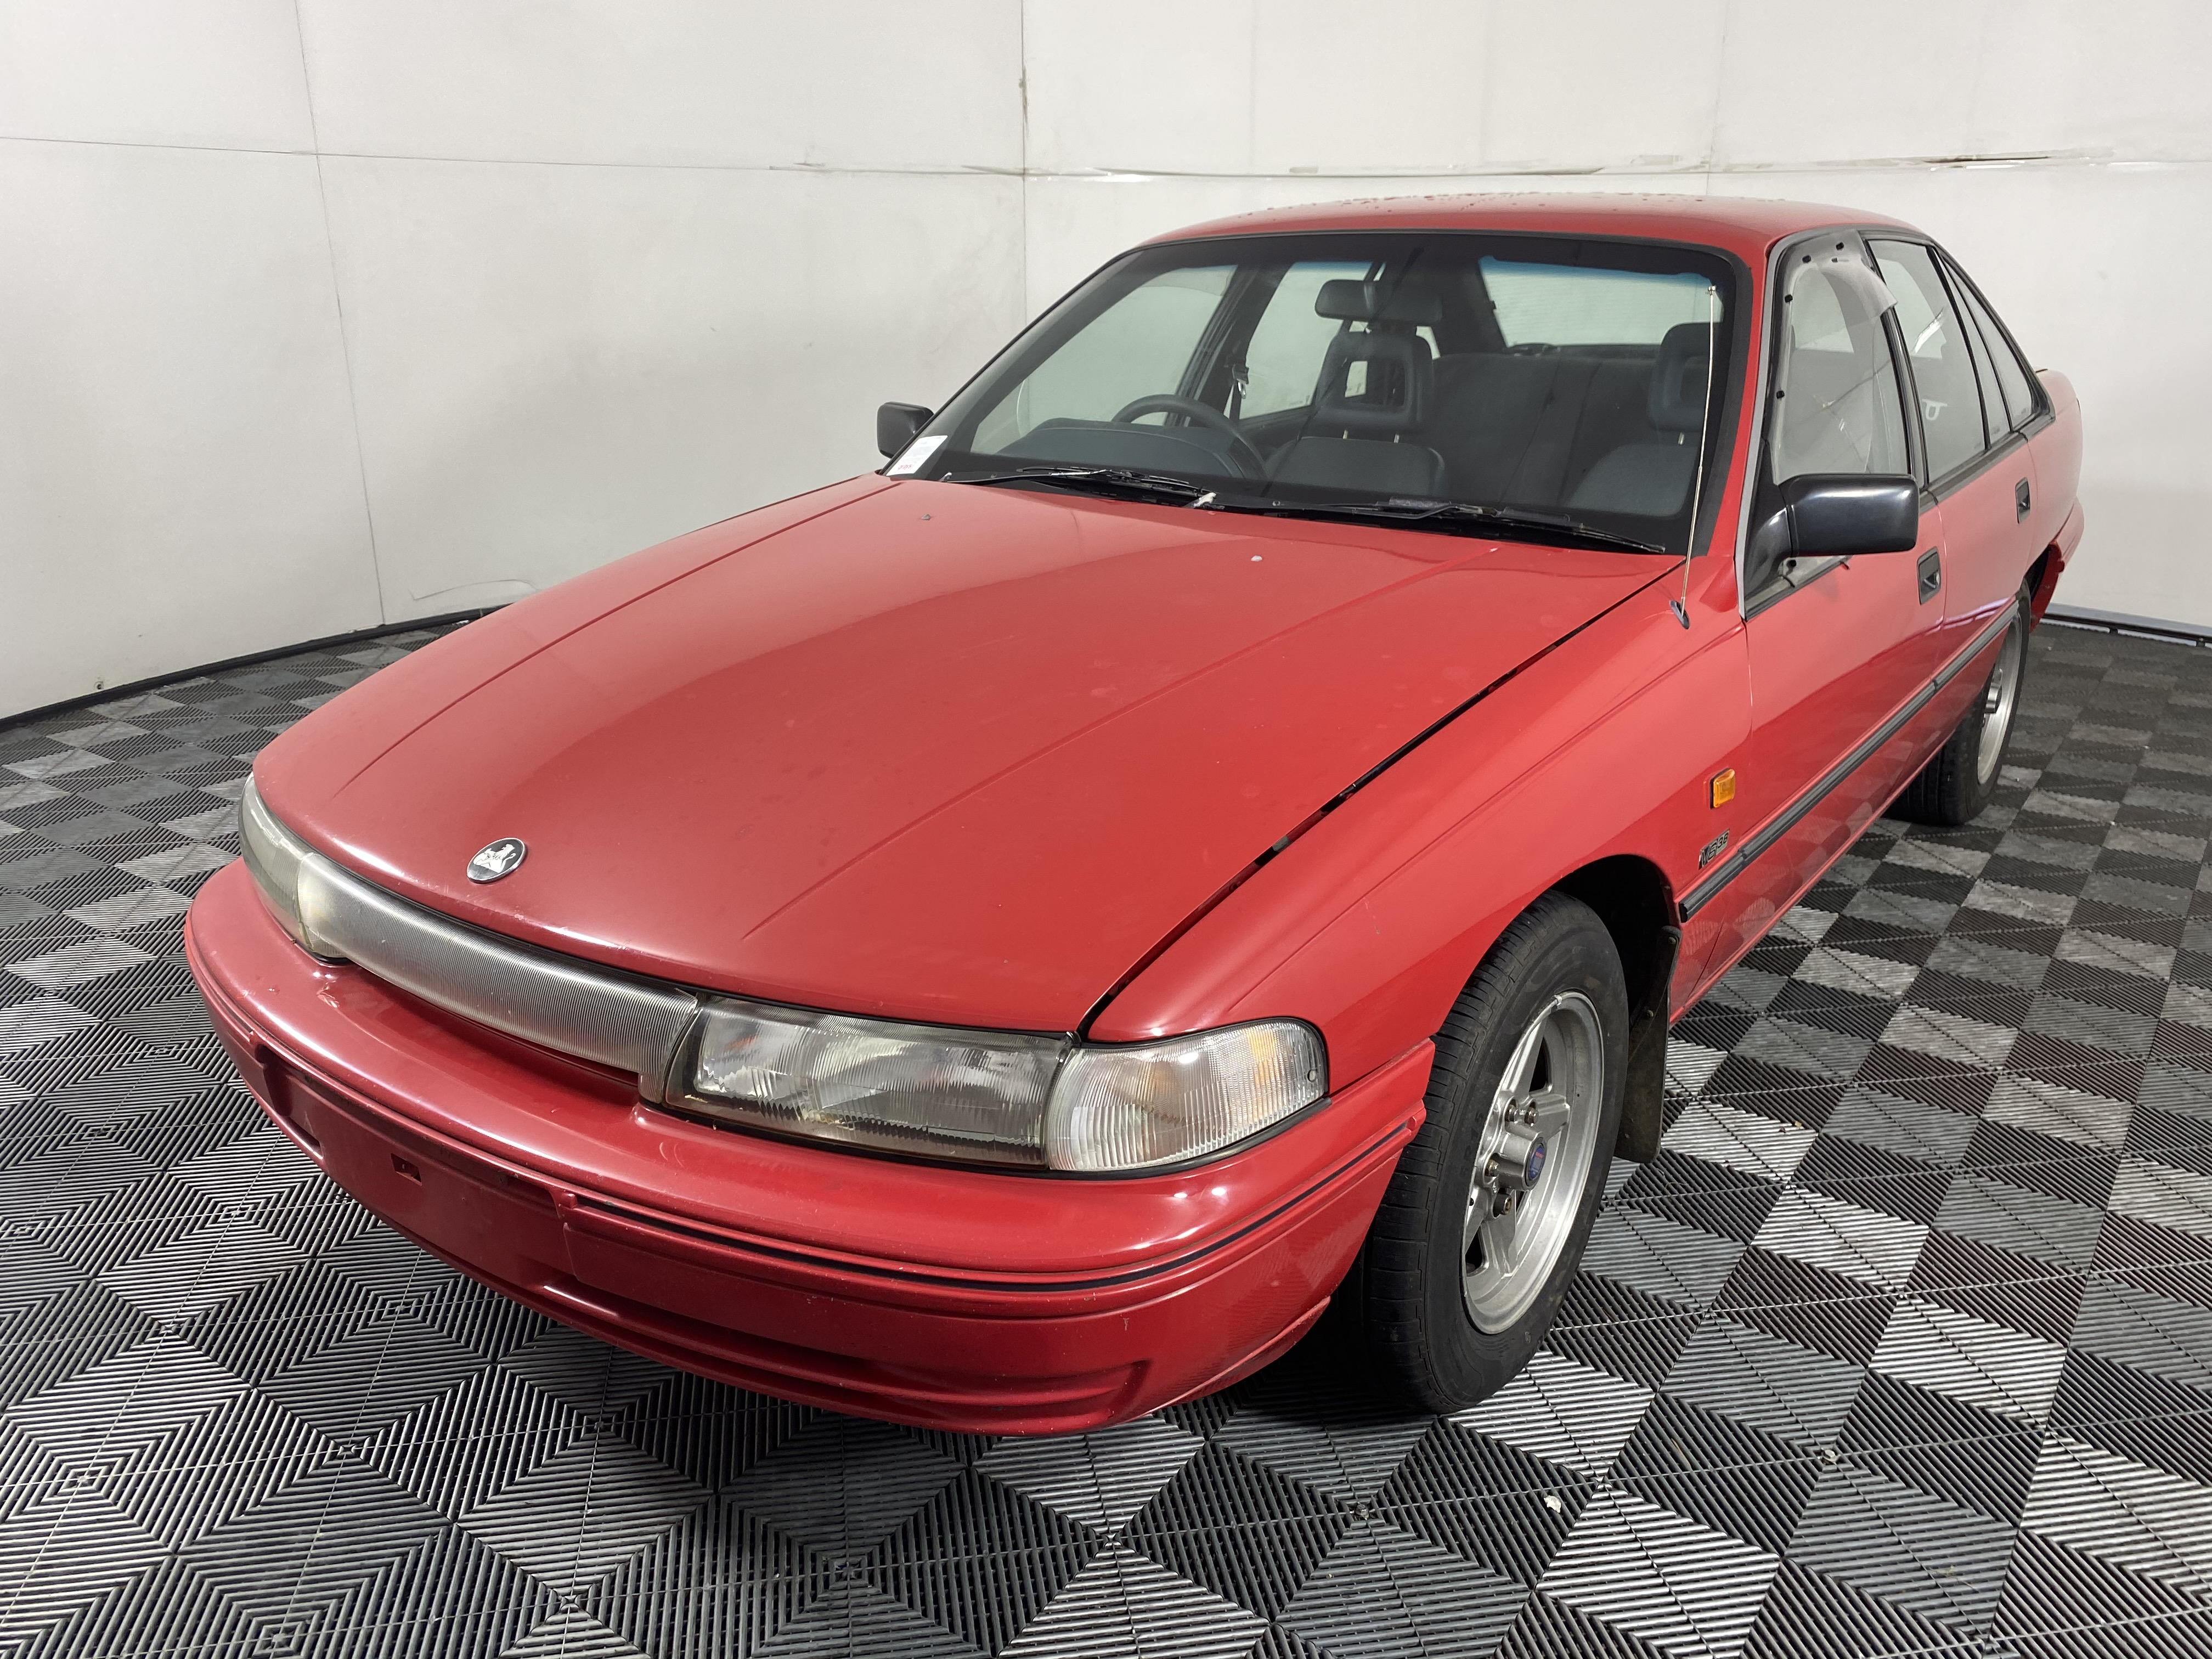 1991 Holden Commodore Executive VP Automatic Sedan